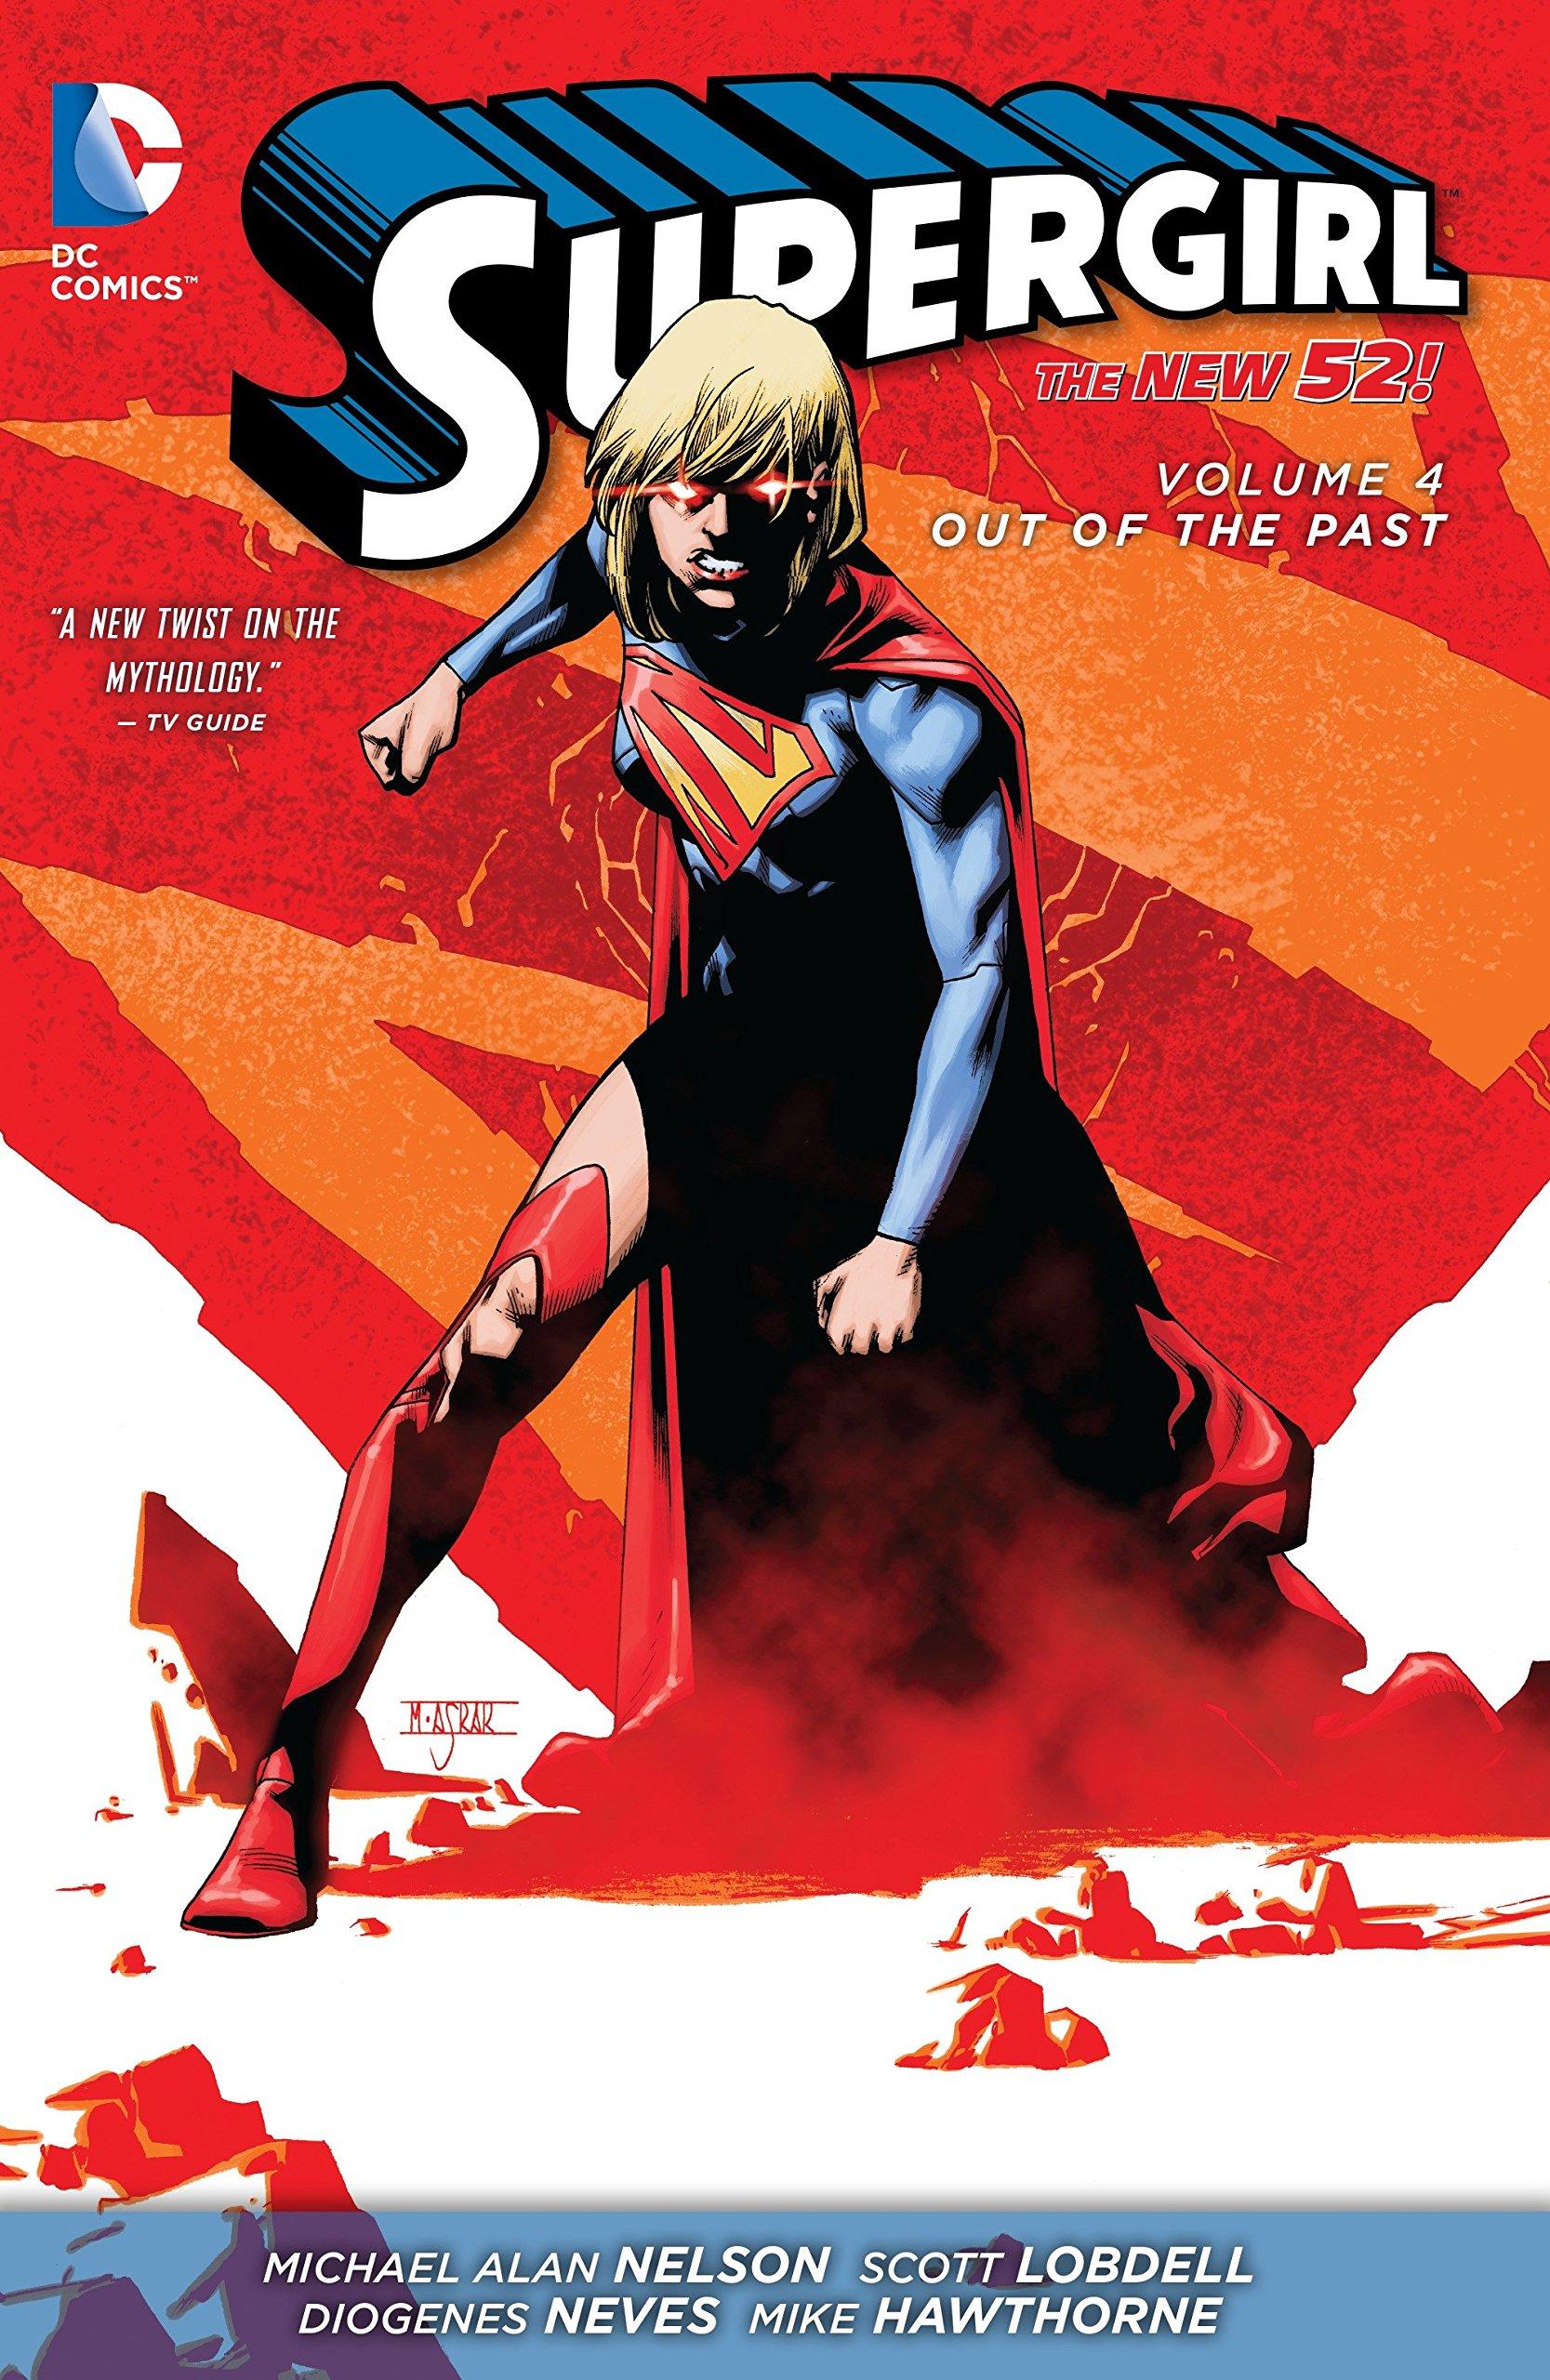 Leer Supergirl News 52